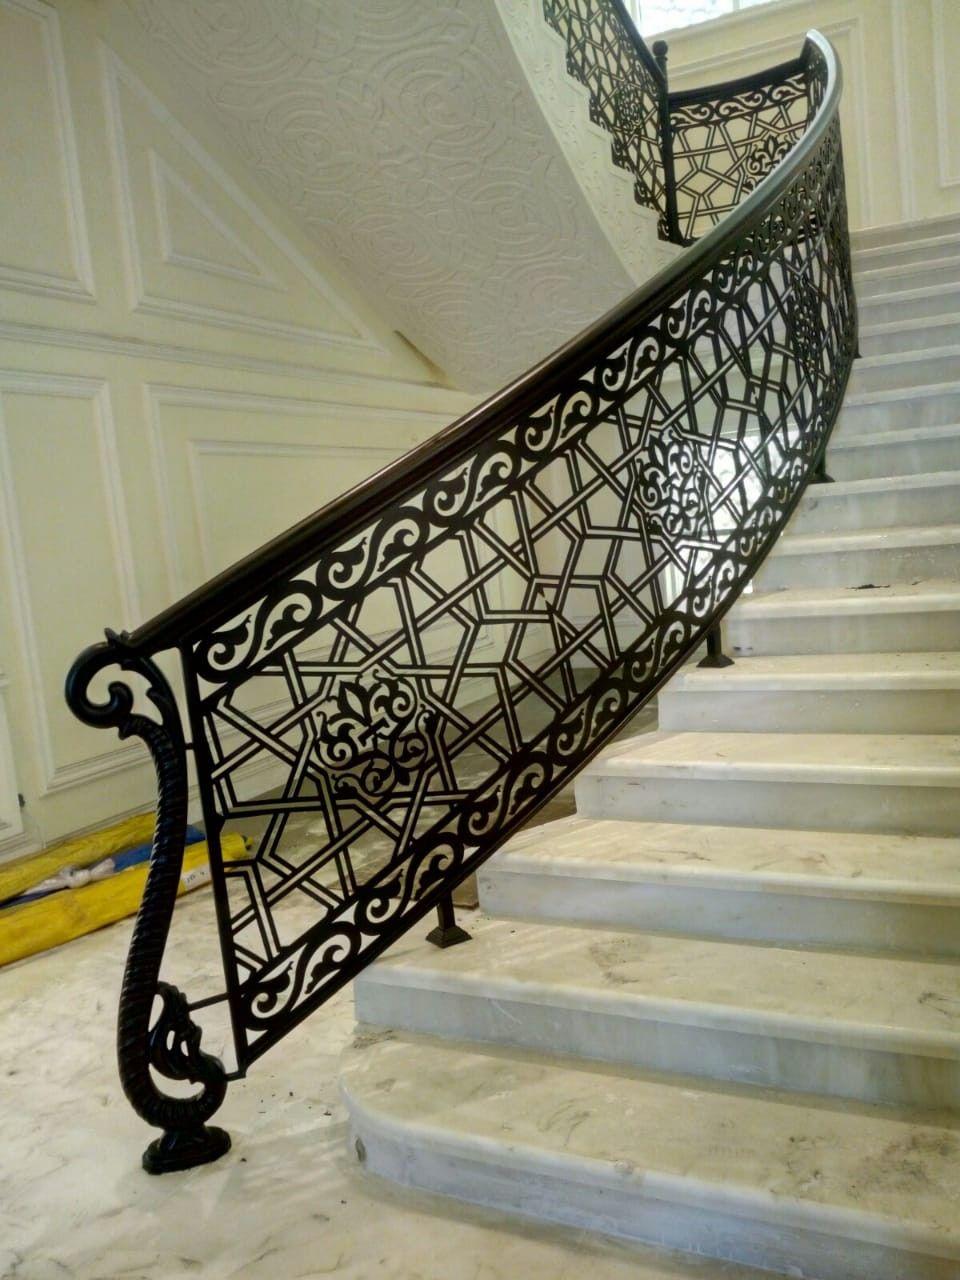 Pin By Khateeb Khateeb On Handrail Stairs Design Interior Iron Staircase Railing Stair Railing Design